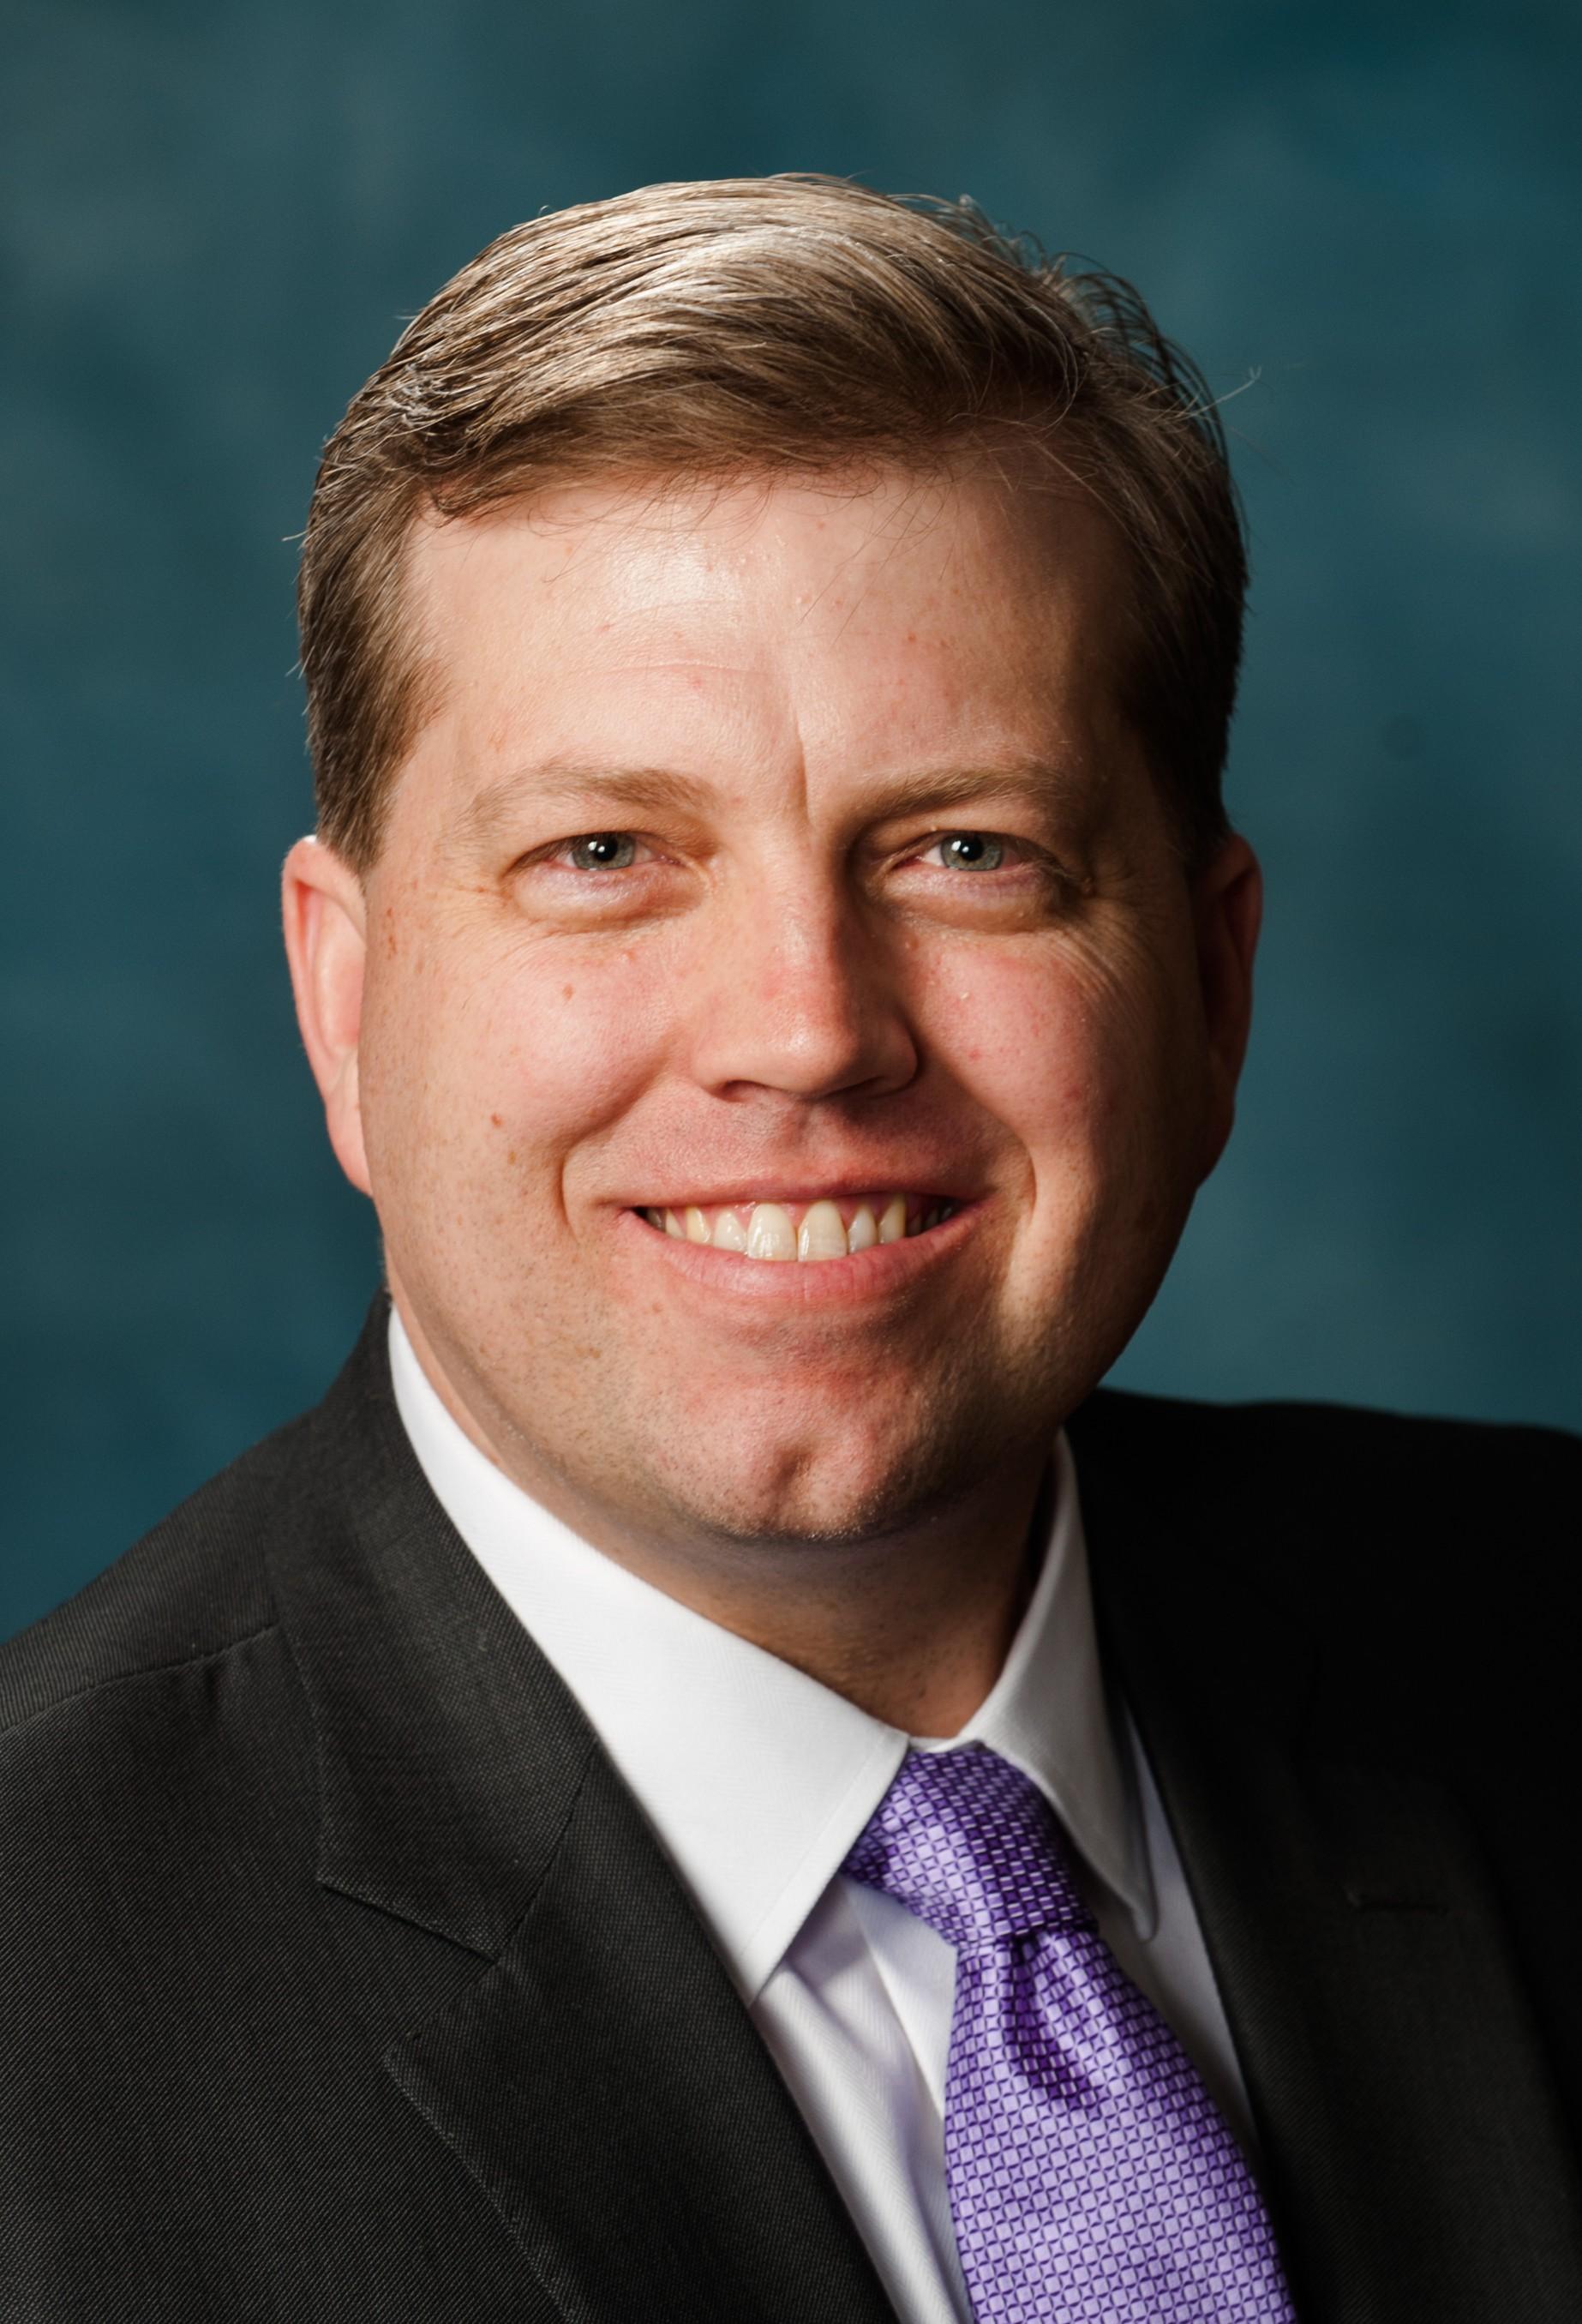 Dr. Christian T. Sinclair